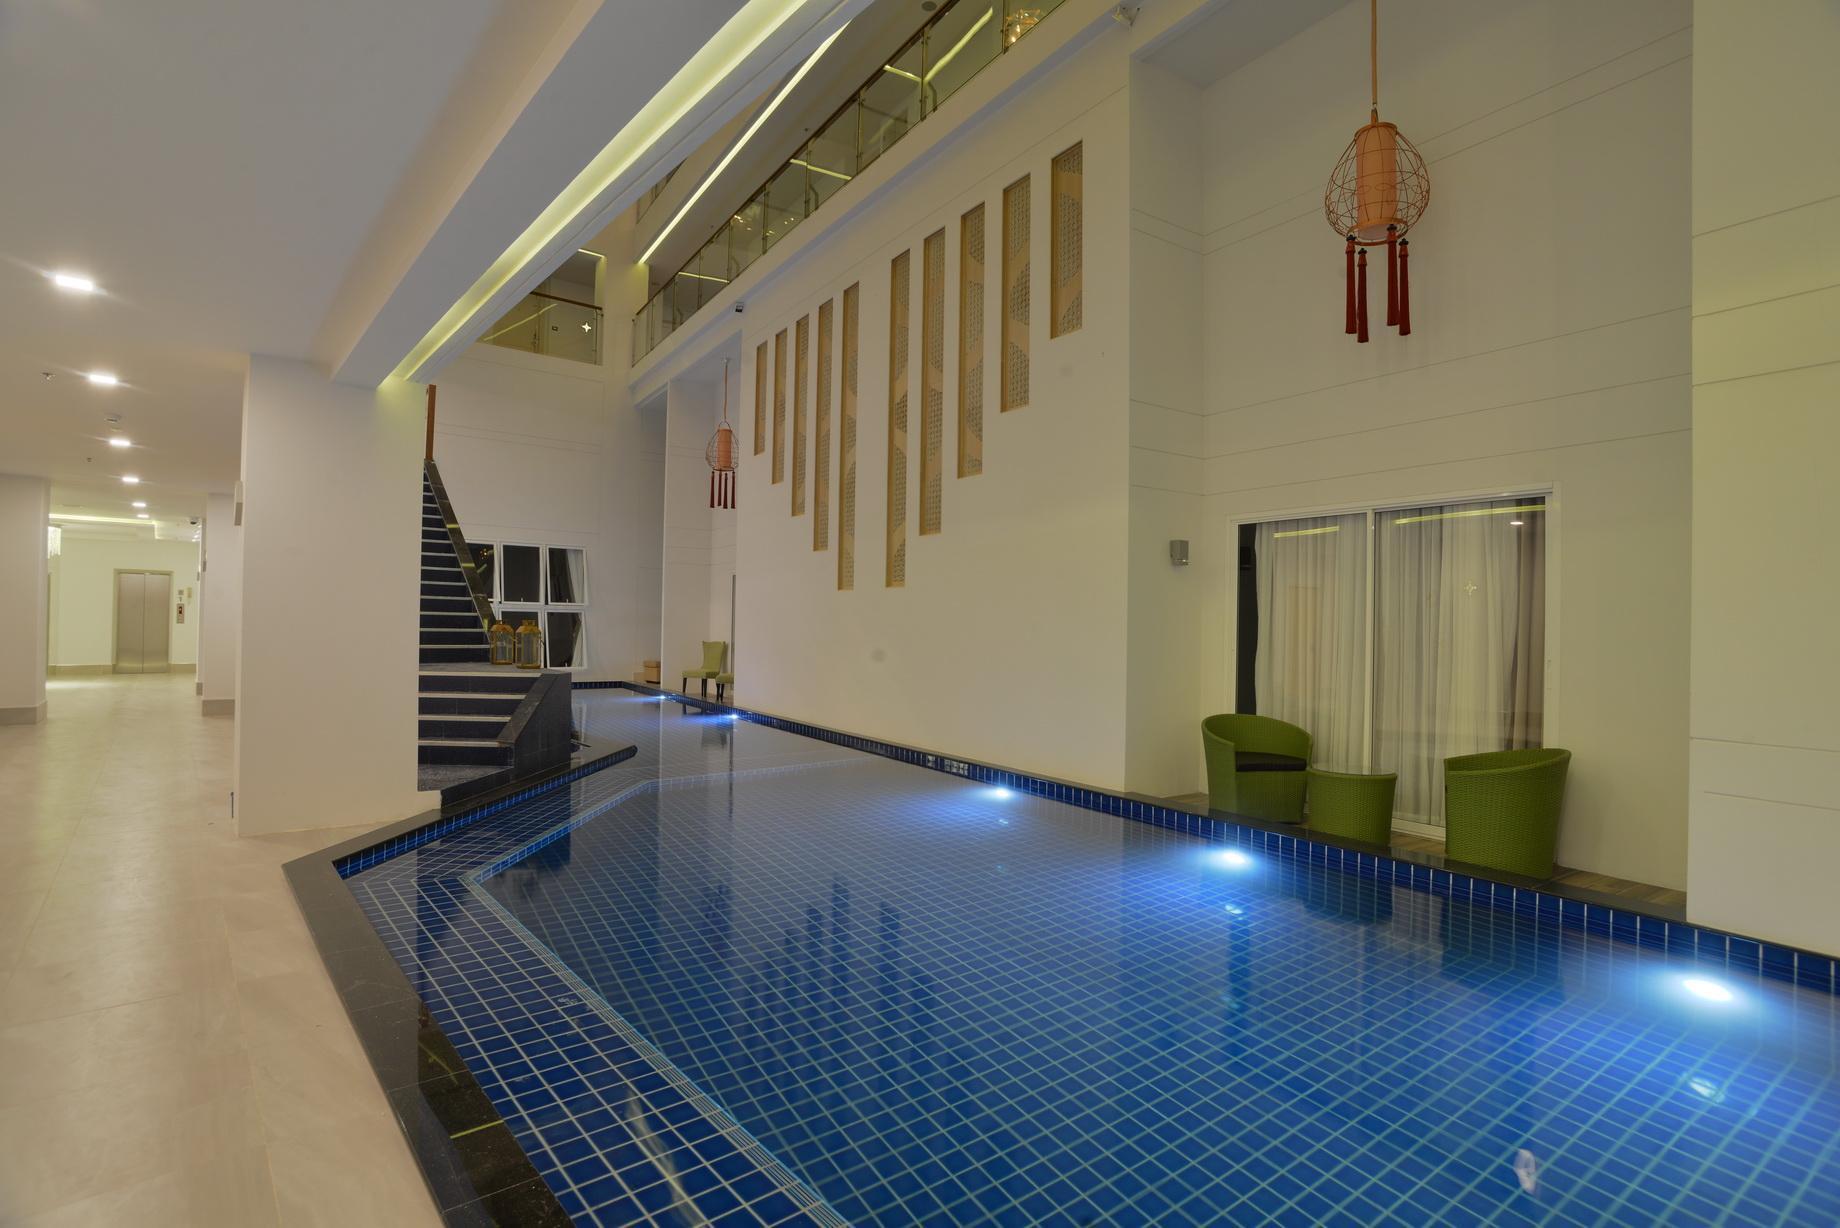 Baisirimaya Hotel โรงแรมบายสิริมายา